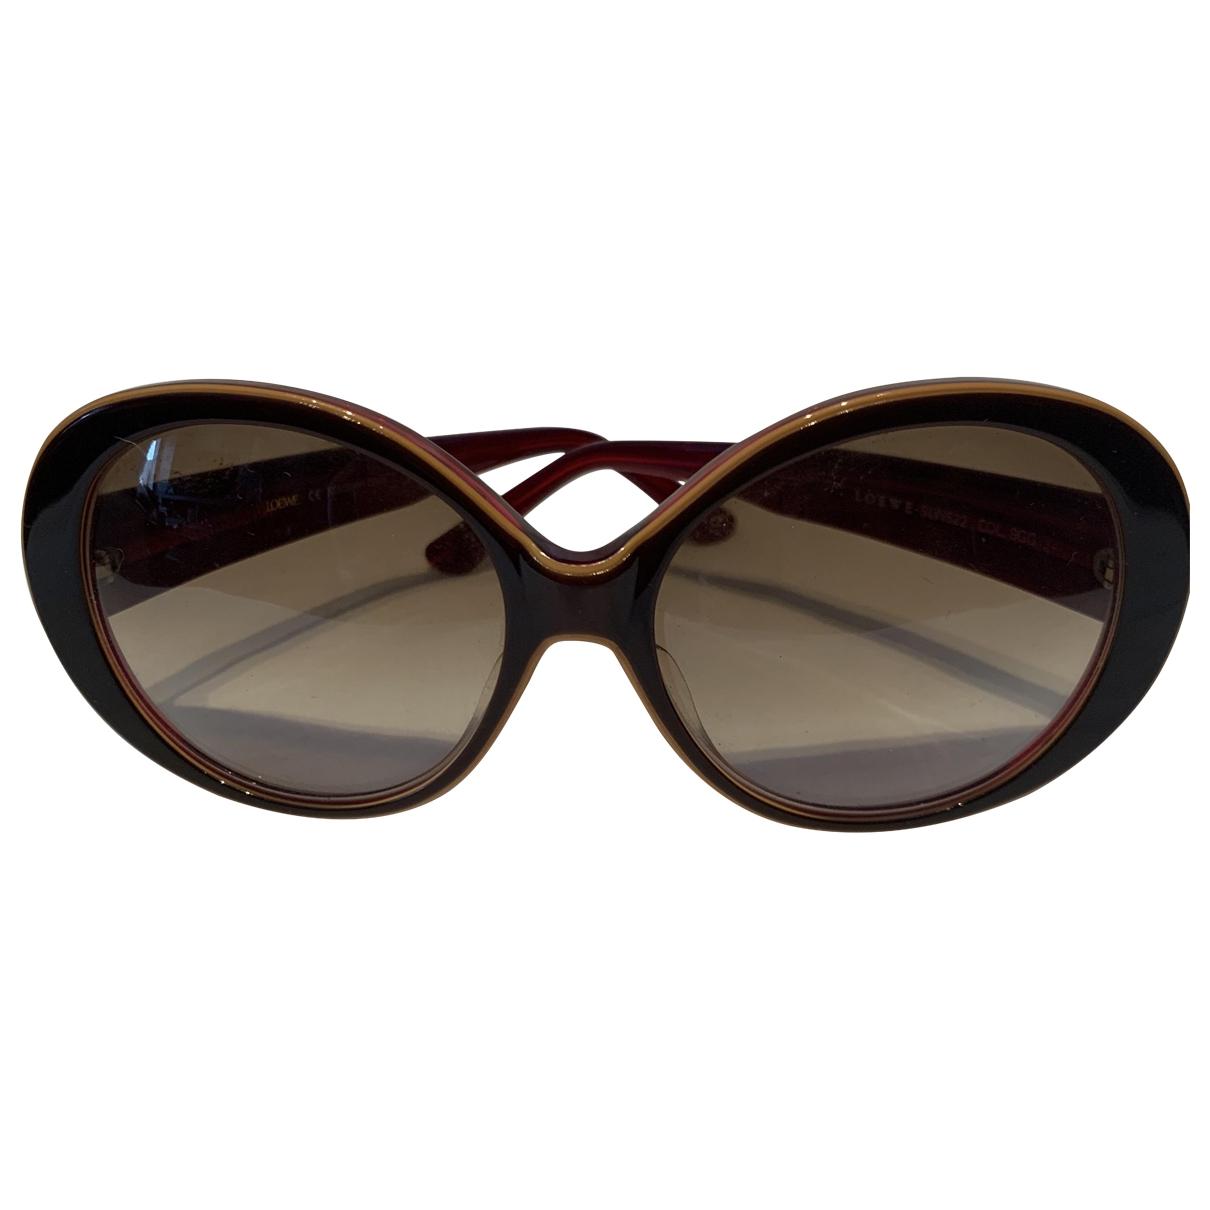 Loewe \N Burgundy Sunglasses for Women XL International